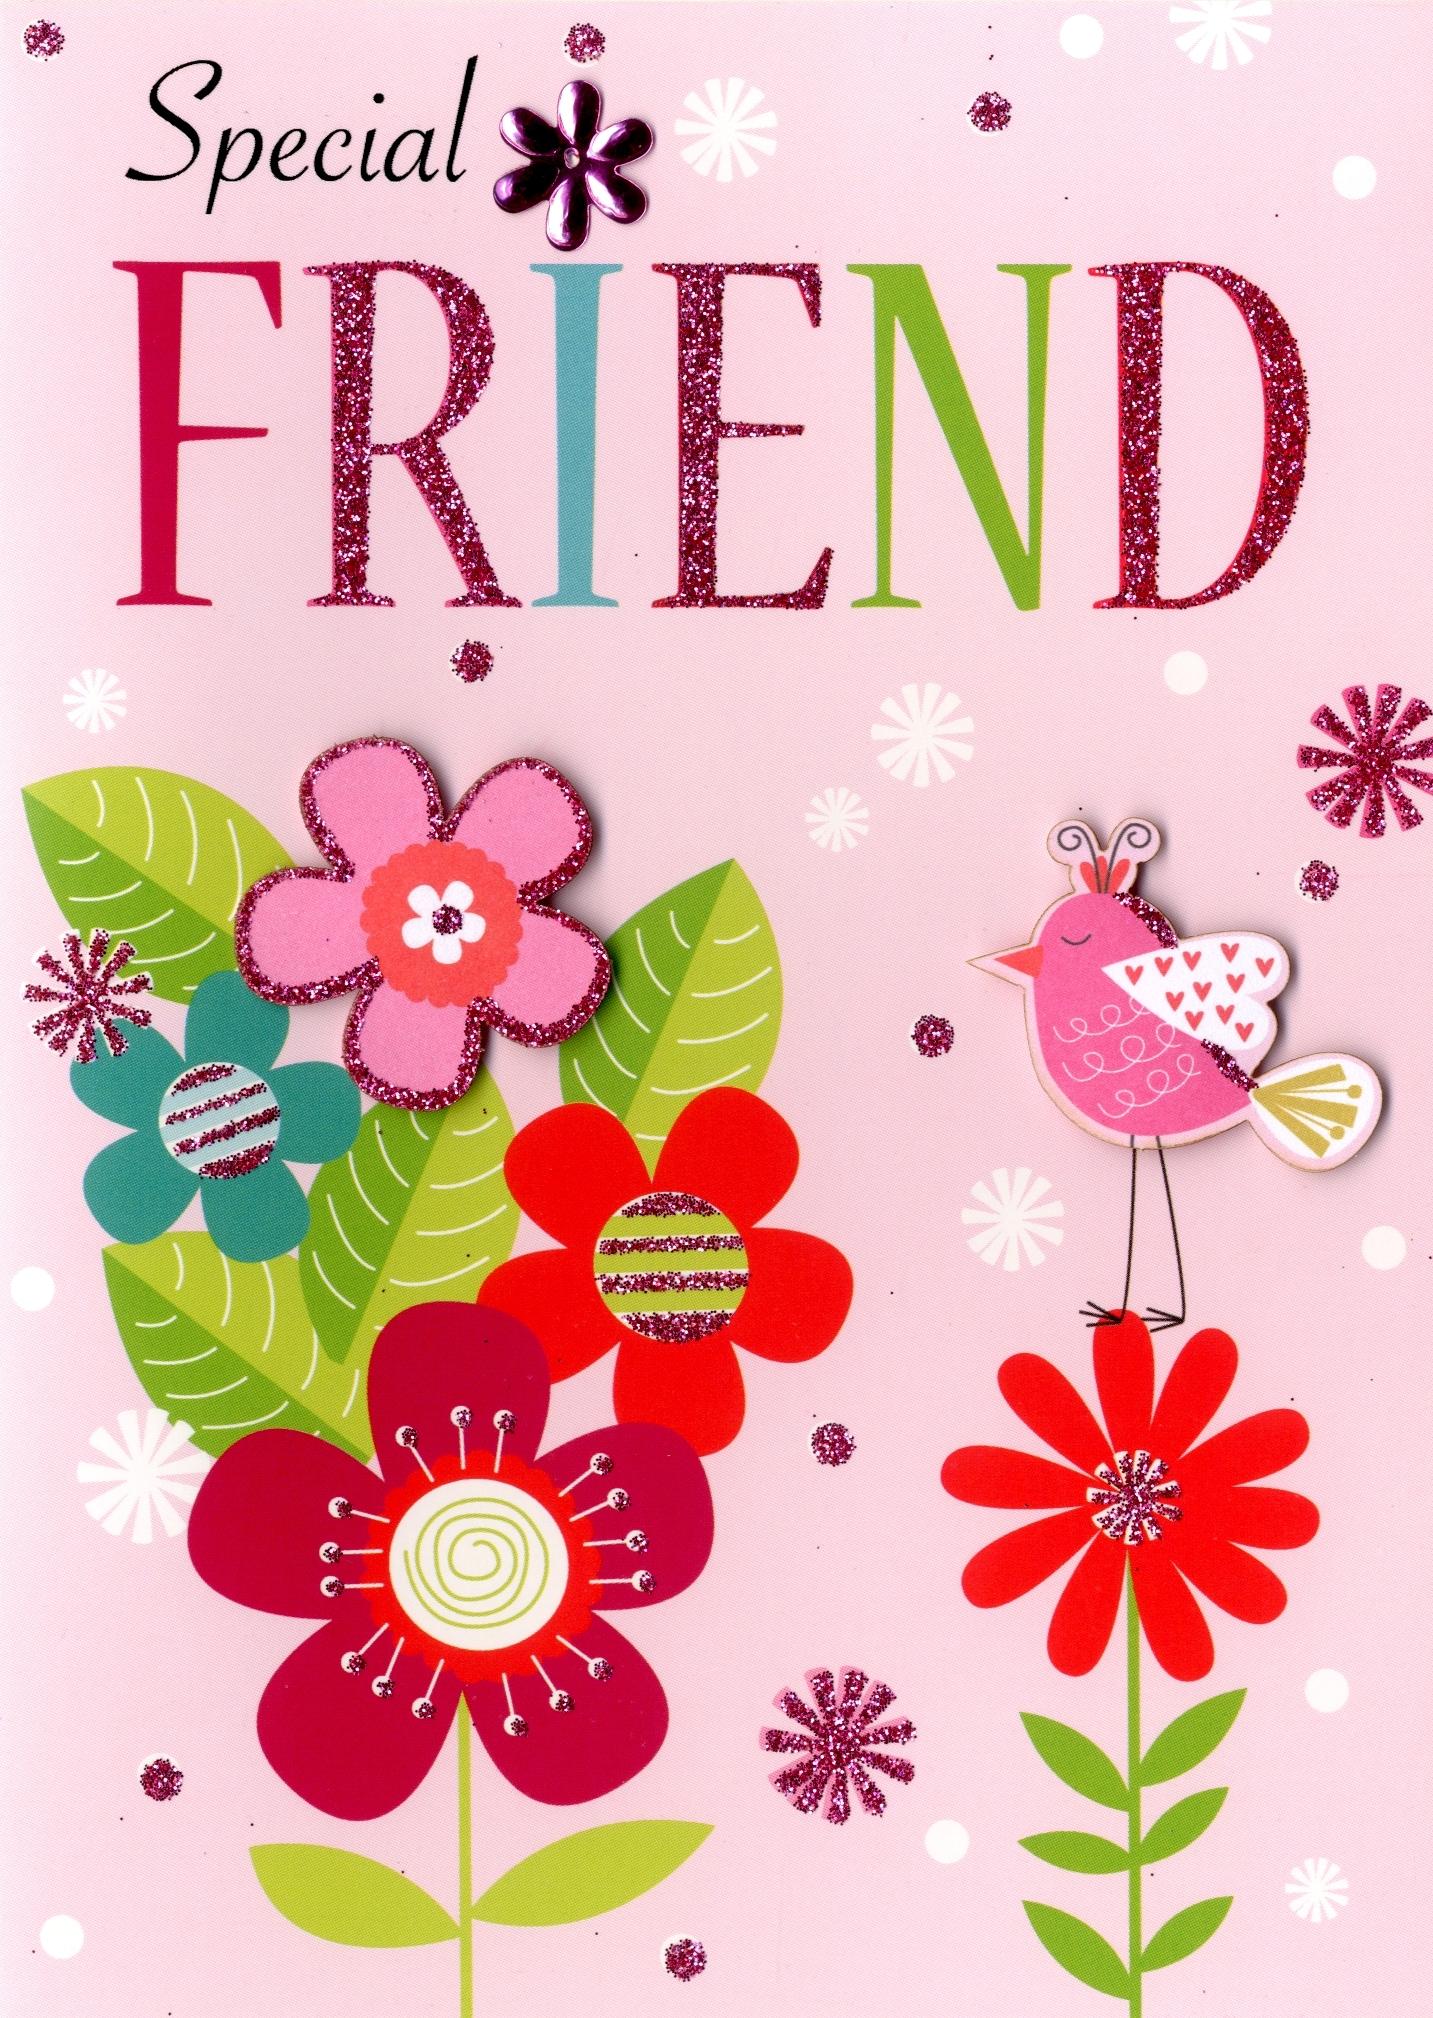 special friend birthday greeting